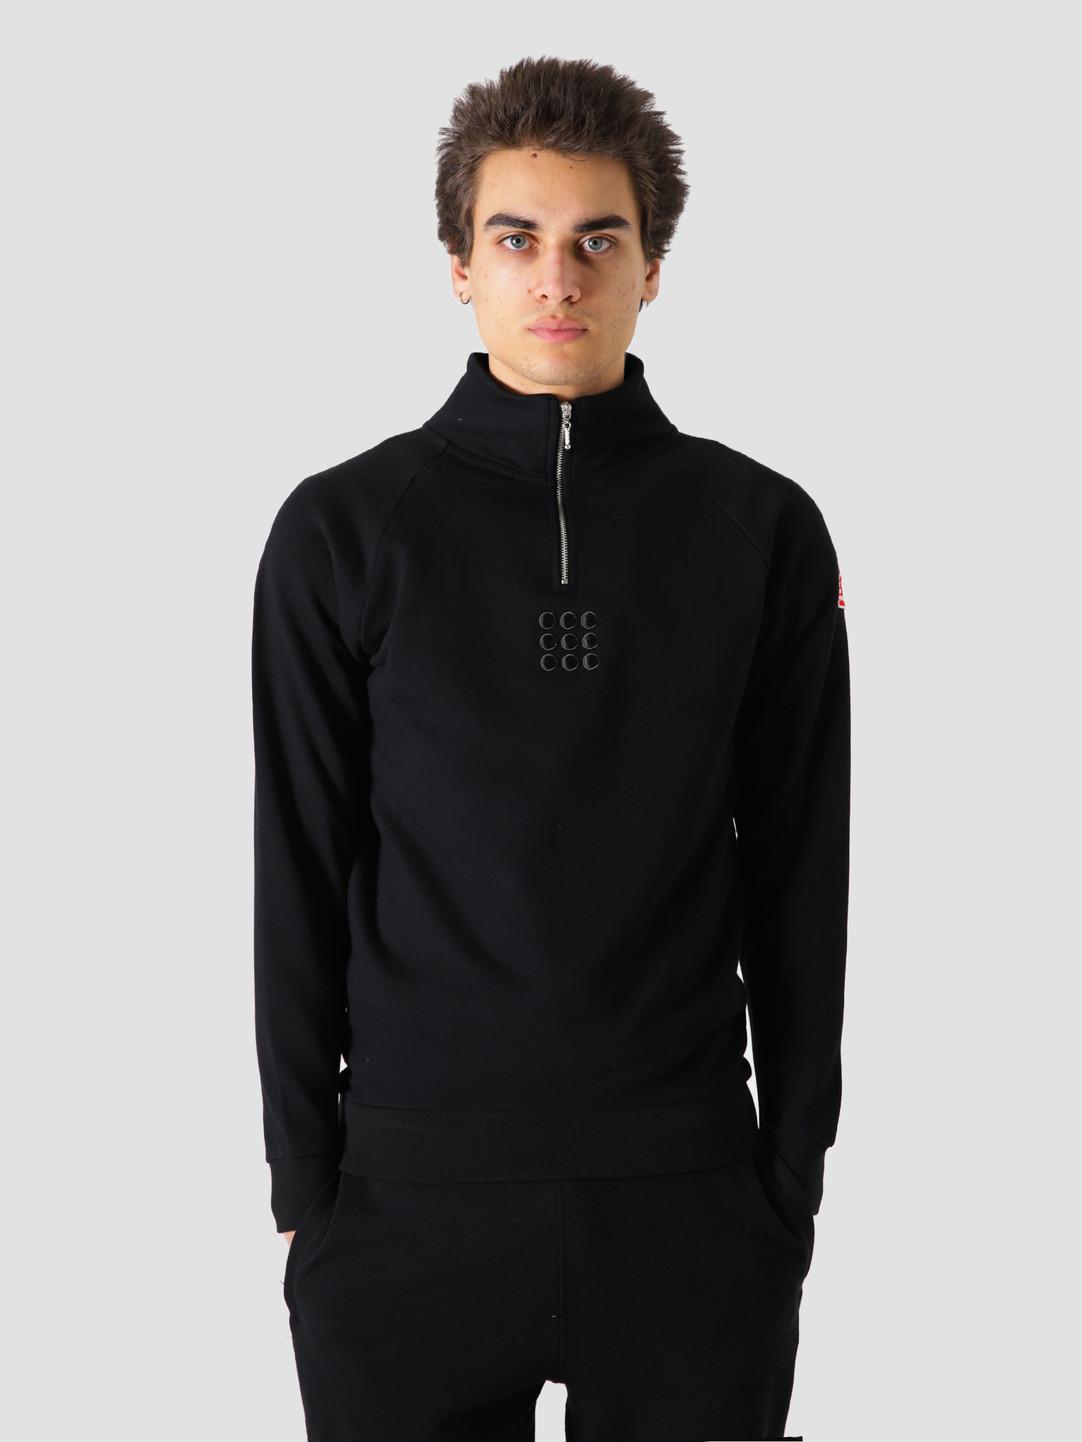 The New Originals The New Originals Testudo Sweater Black